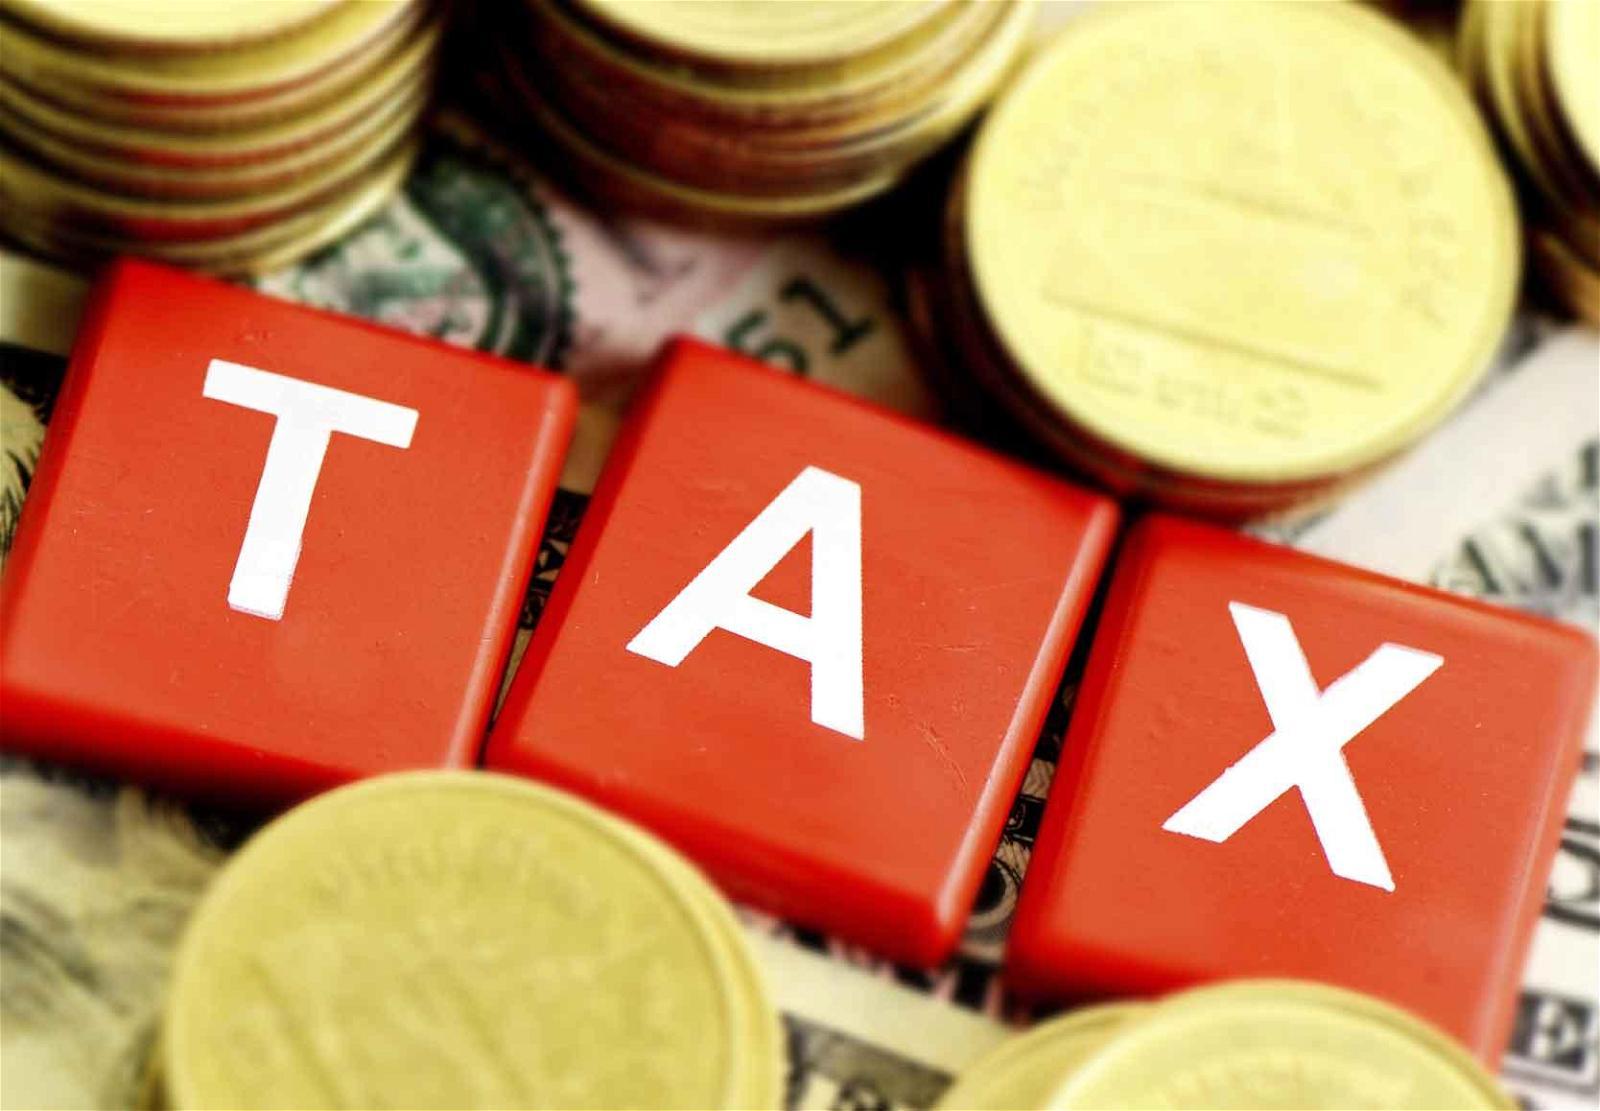 Work on VAT implementation, not increase,Ex-ANAN president urges FG